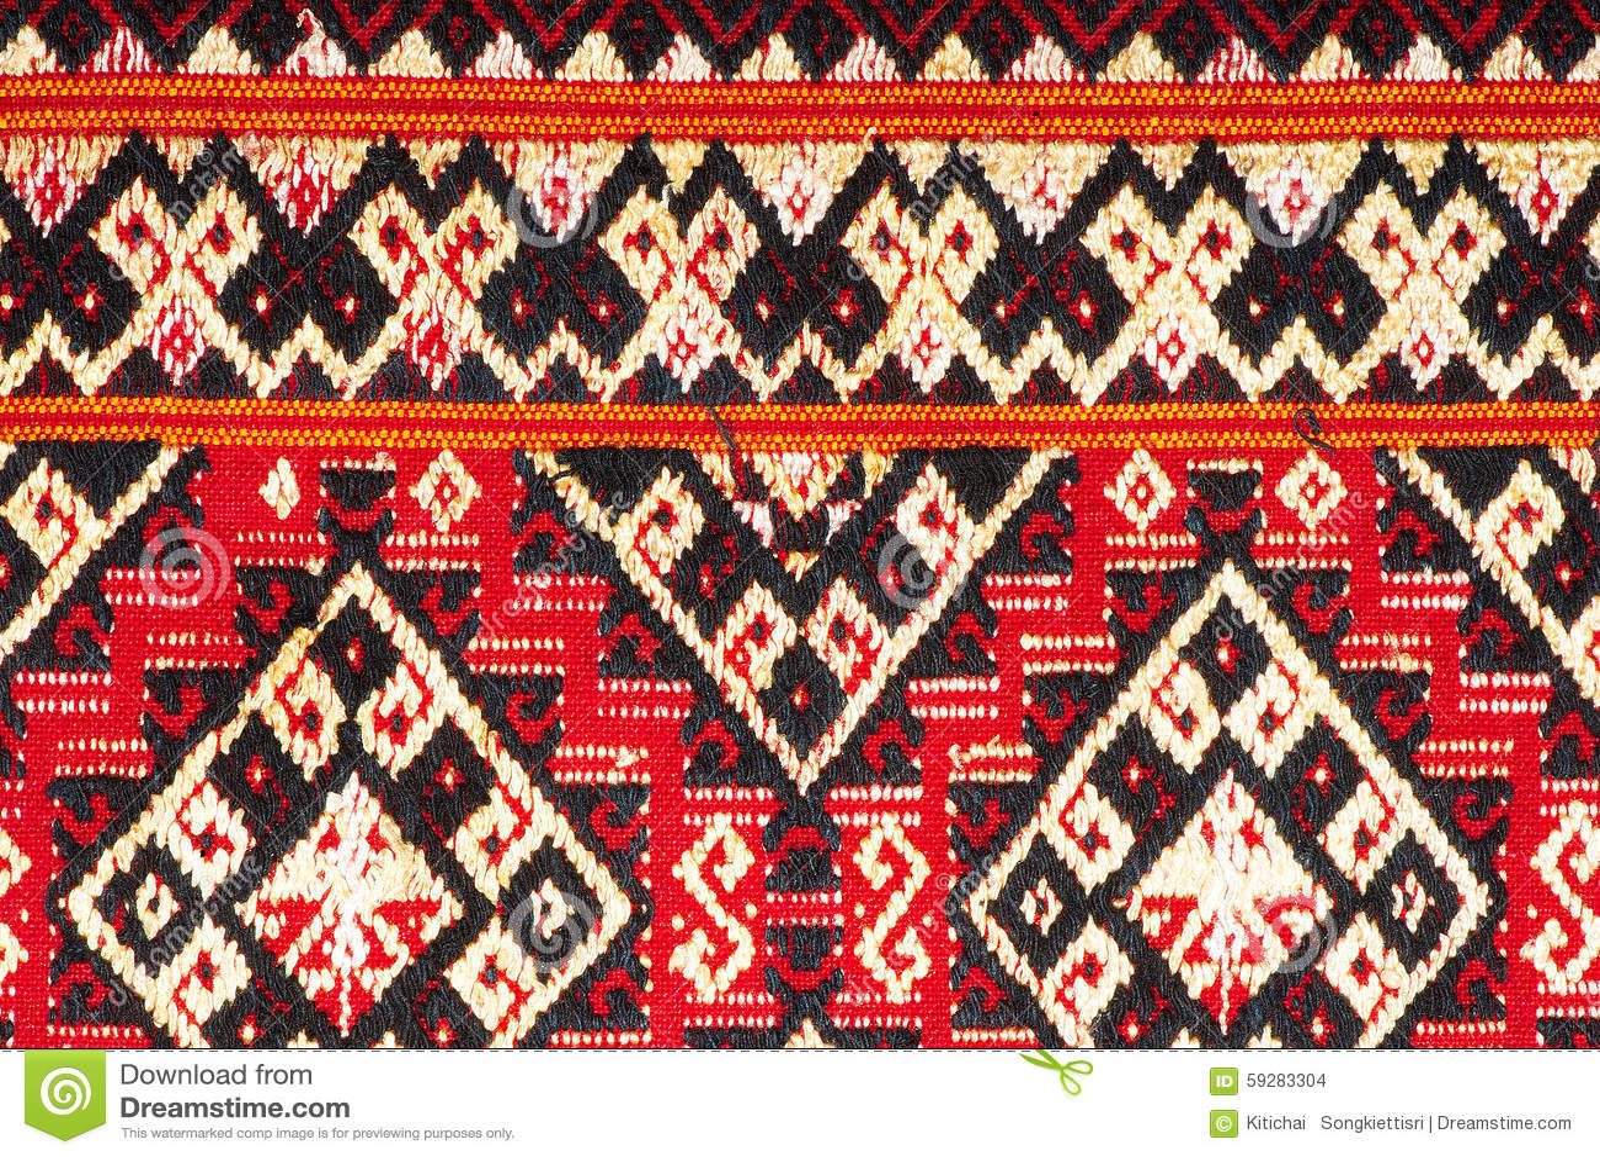 Colorful Thai Silk Handcraft Peruvian Style Rug Surface